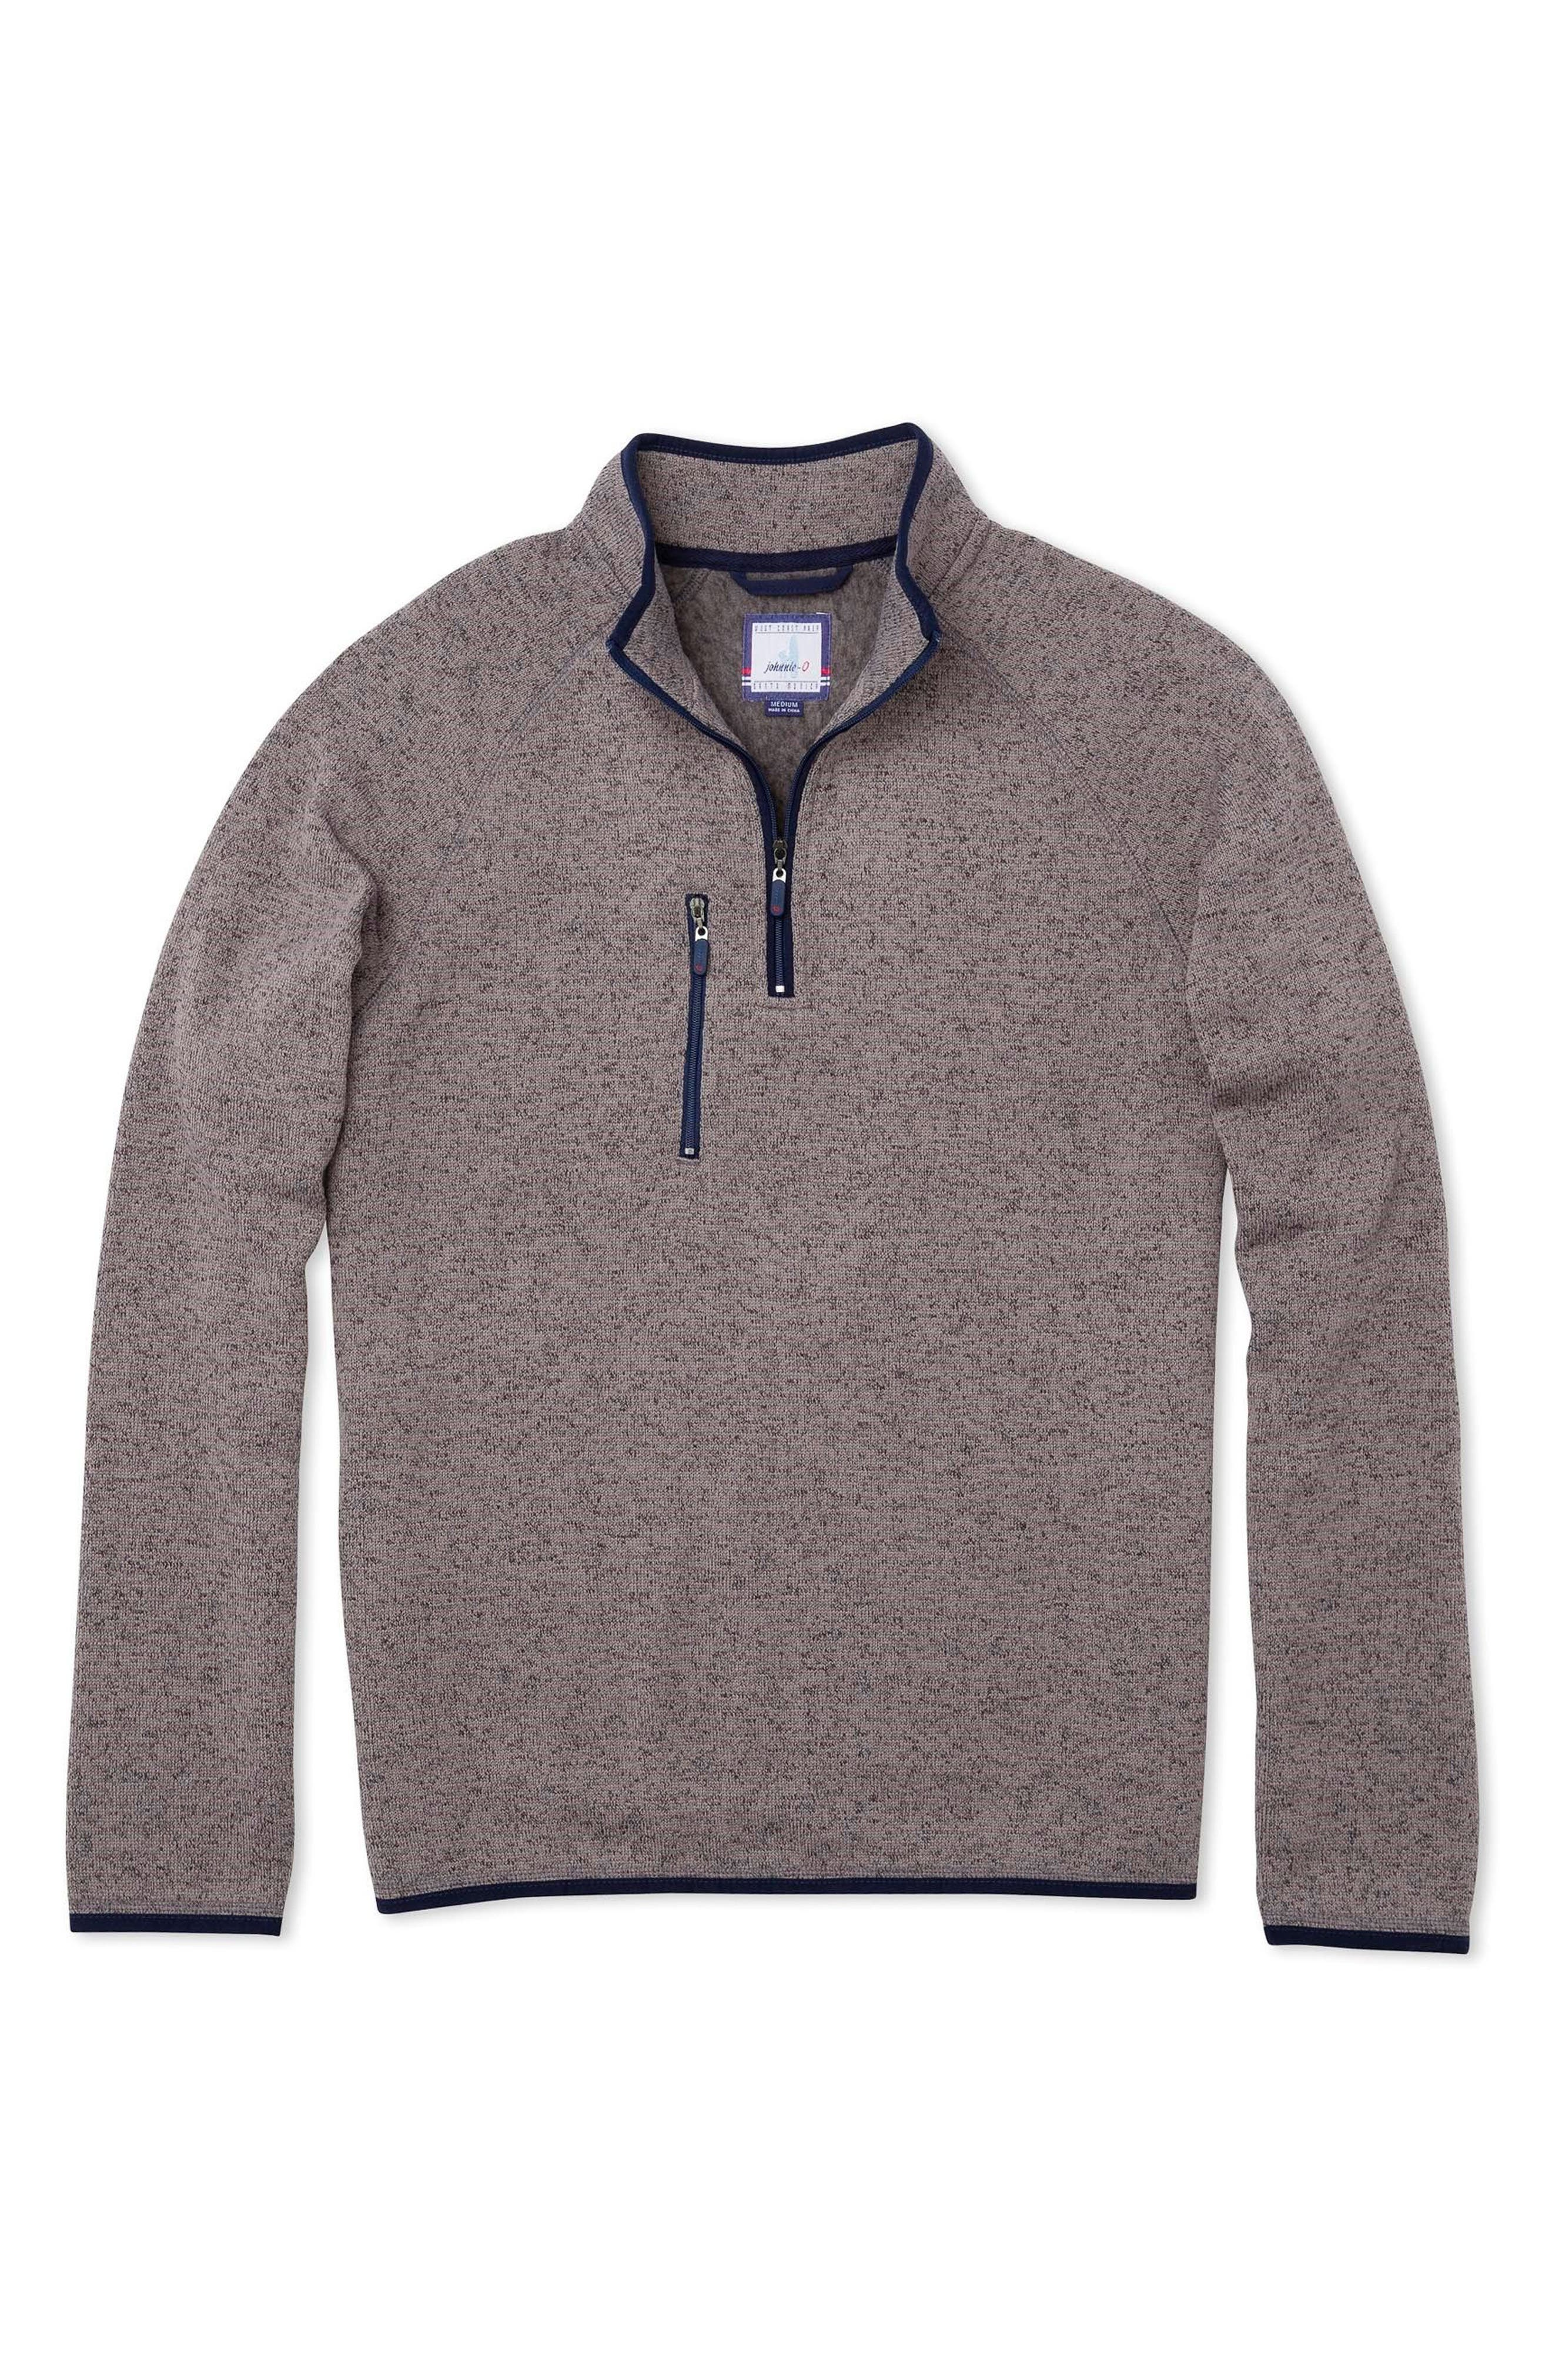 Main Image - johnnie-o Yukon Quarter Zip Sweatshirt (Little Boys & Big Boys)